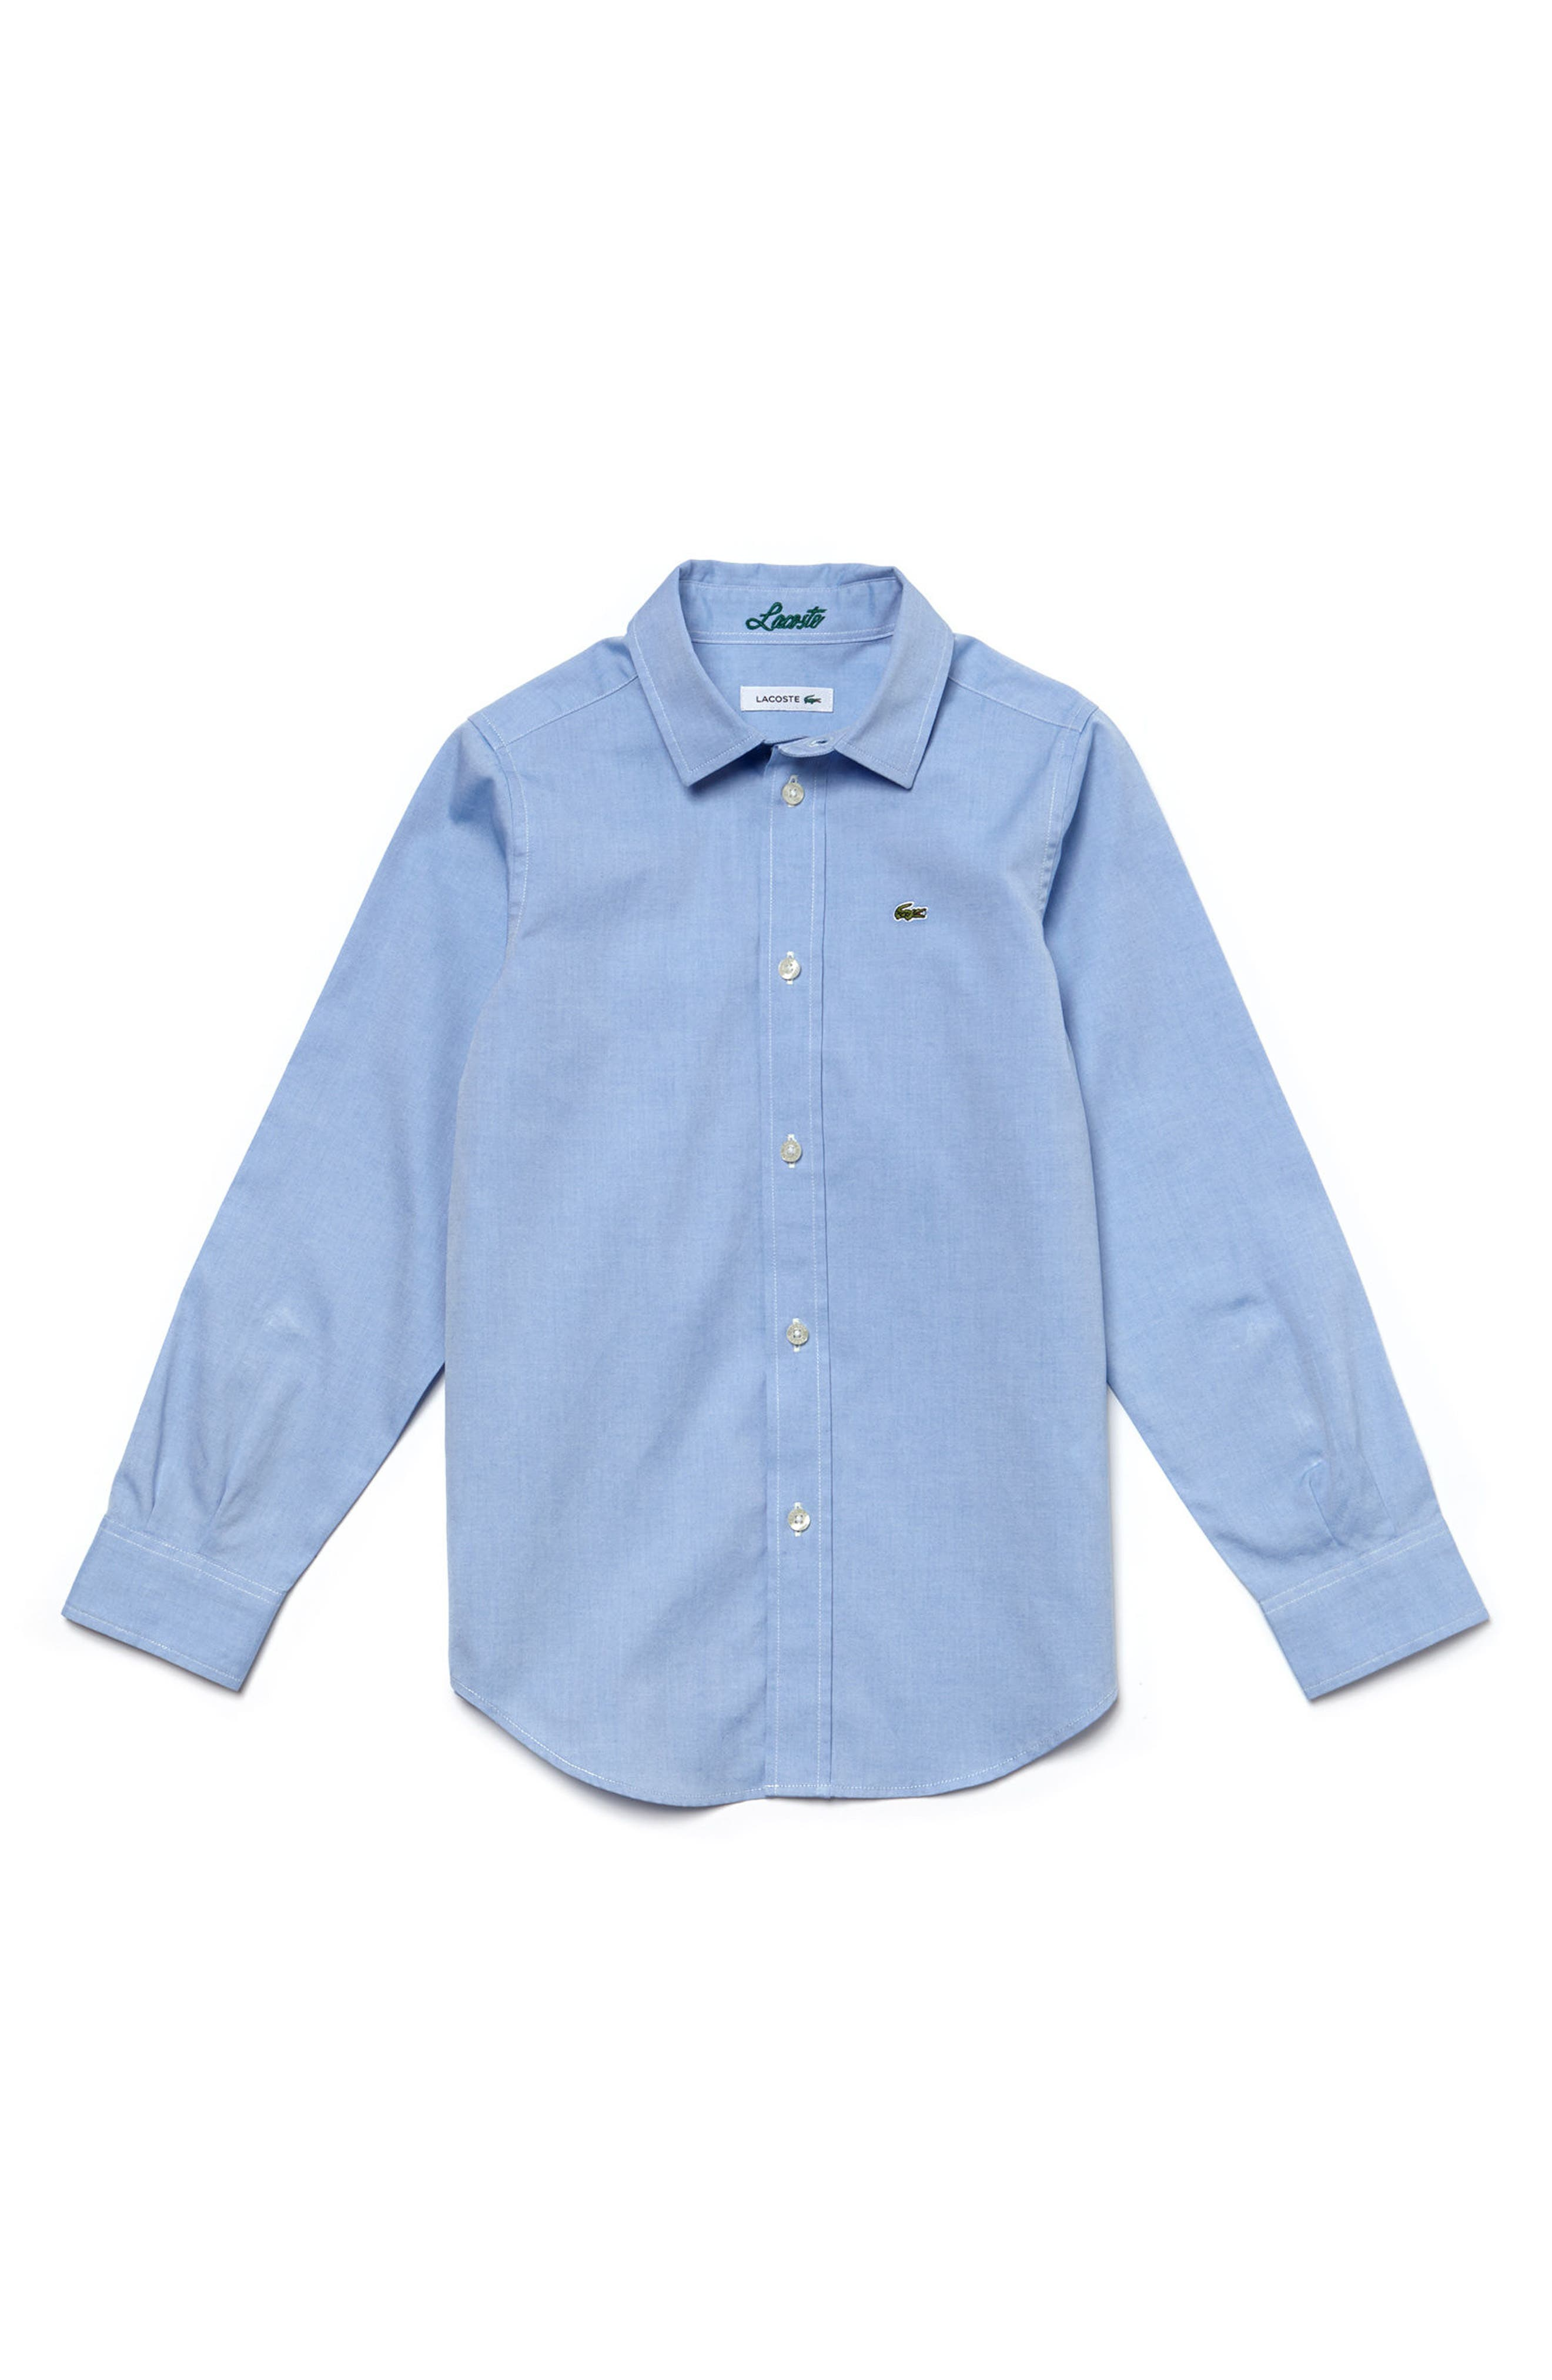 Lacoste Classic Oxford Shirt (Little Boys)